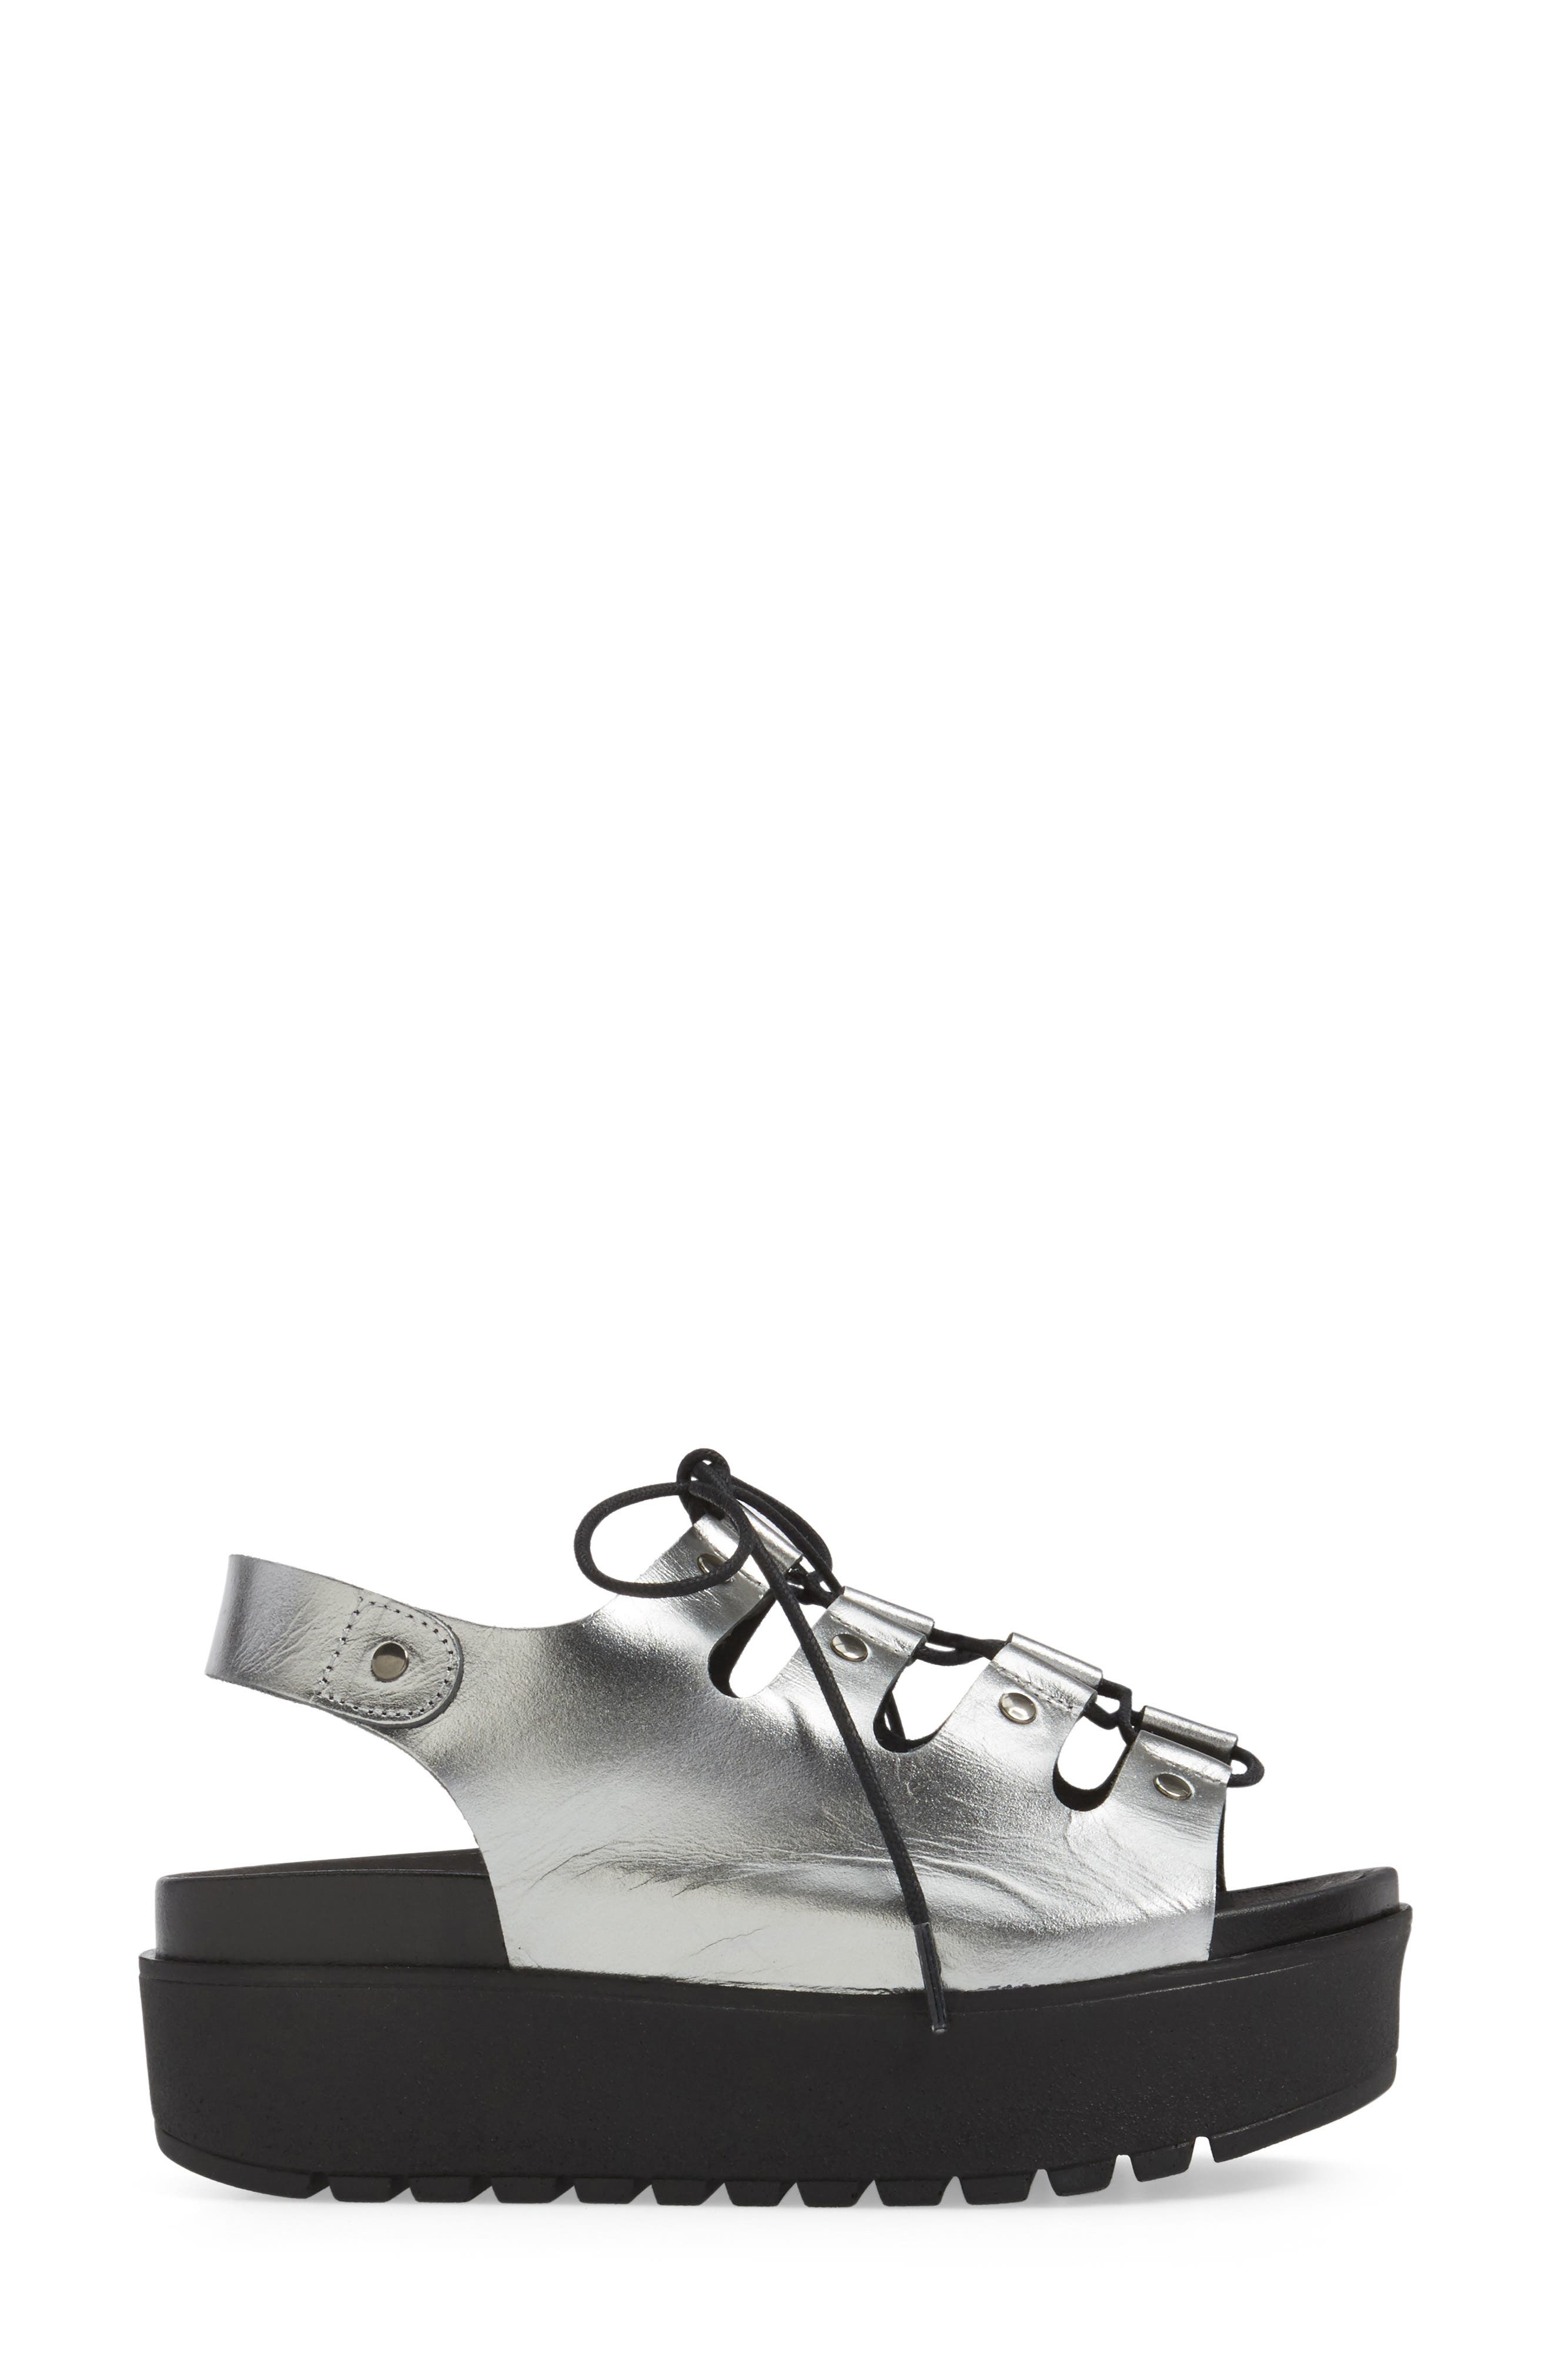 Kacey Platform Sandal,                             Alternate thumbnail 3, color,                             050